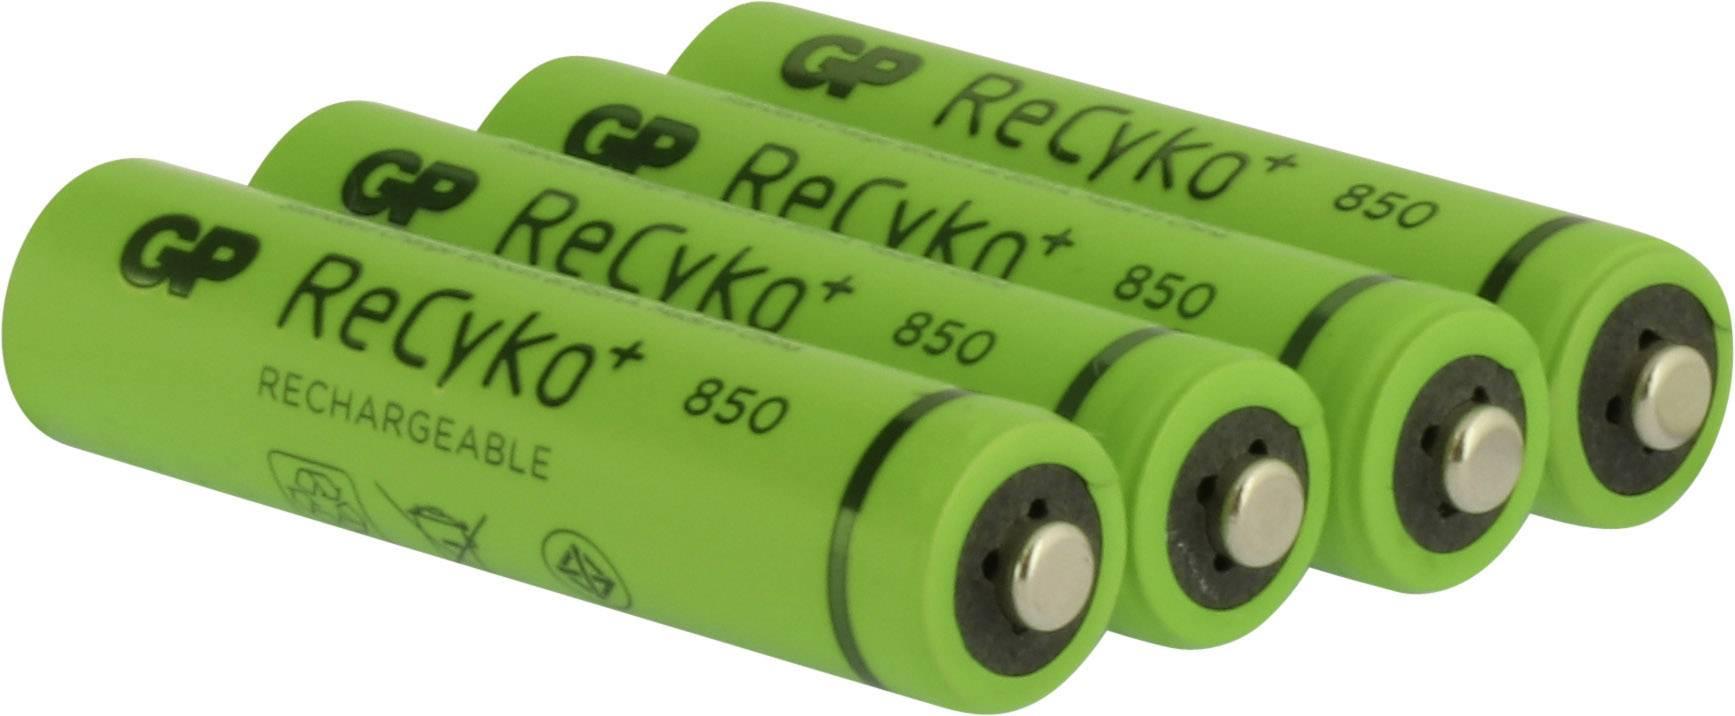 GP Batteries ReCyko+ AAA battery (rechargeable) NiMH 850 ...